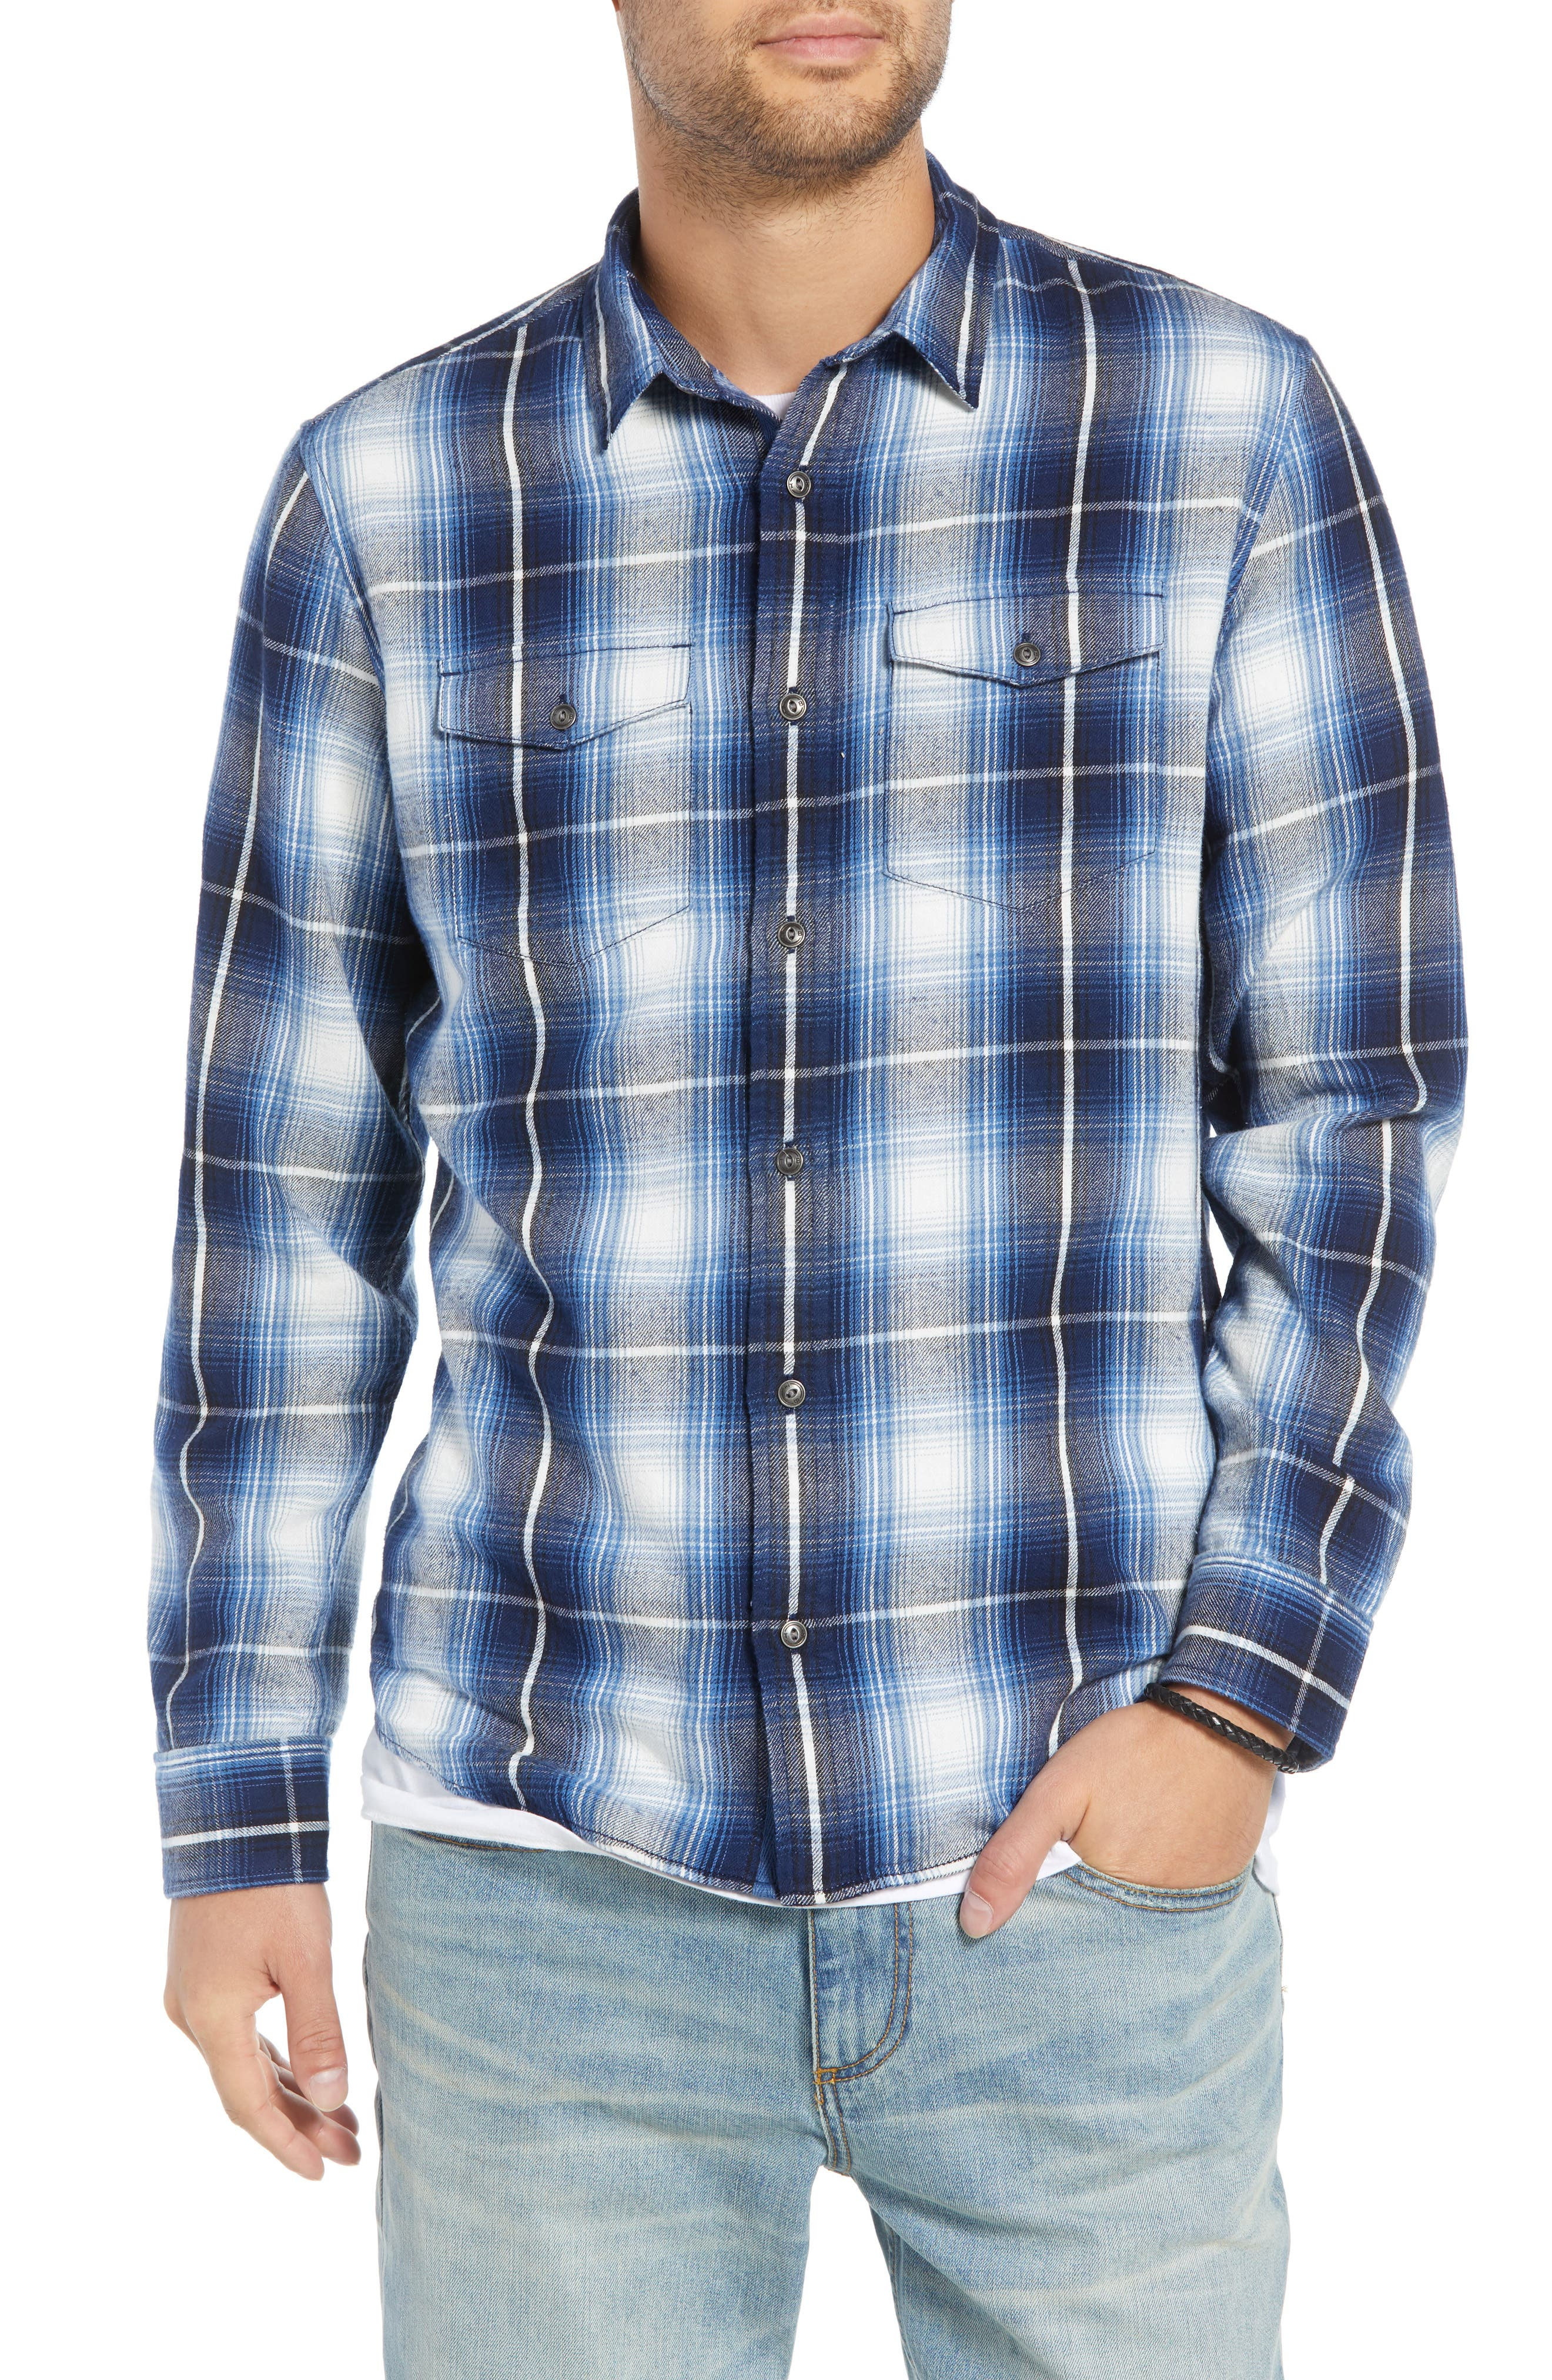 Slim Fit Plaid Flap Pocket Sport Shirt,                         Main,                         color, BLUE CASPIA RIVER PLAID